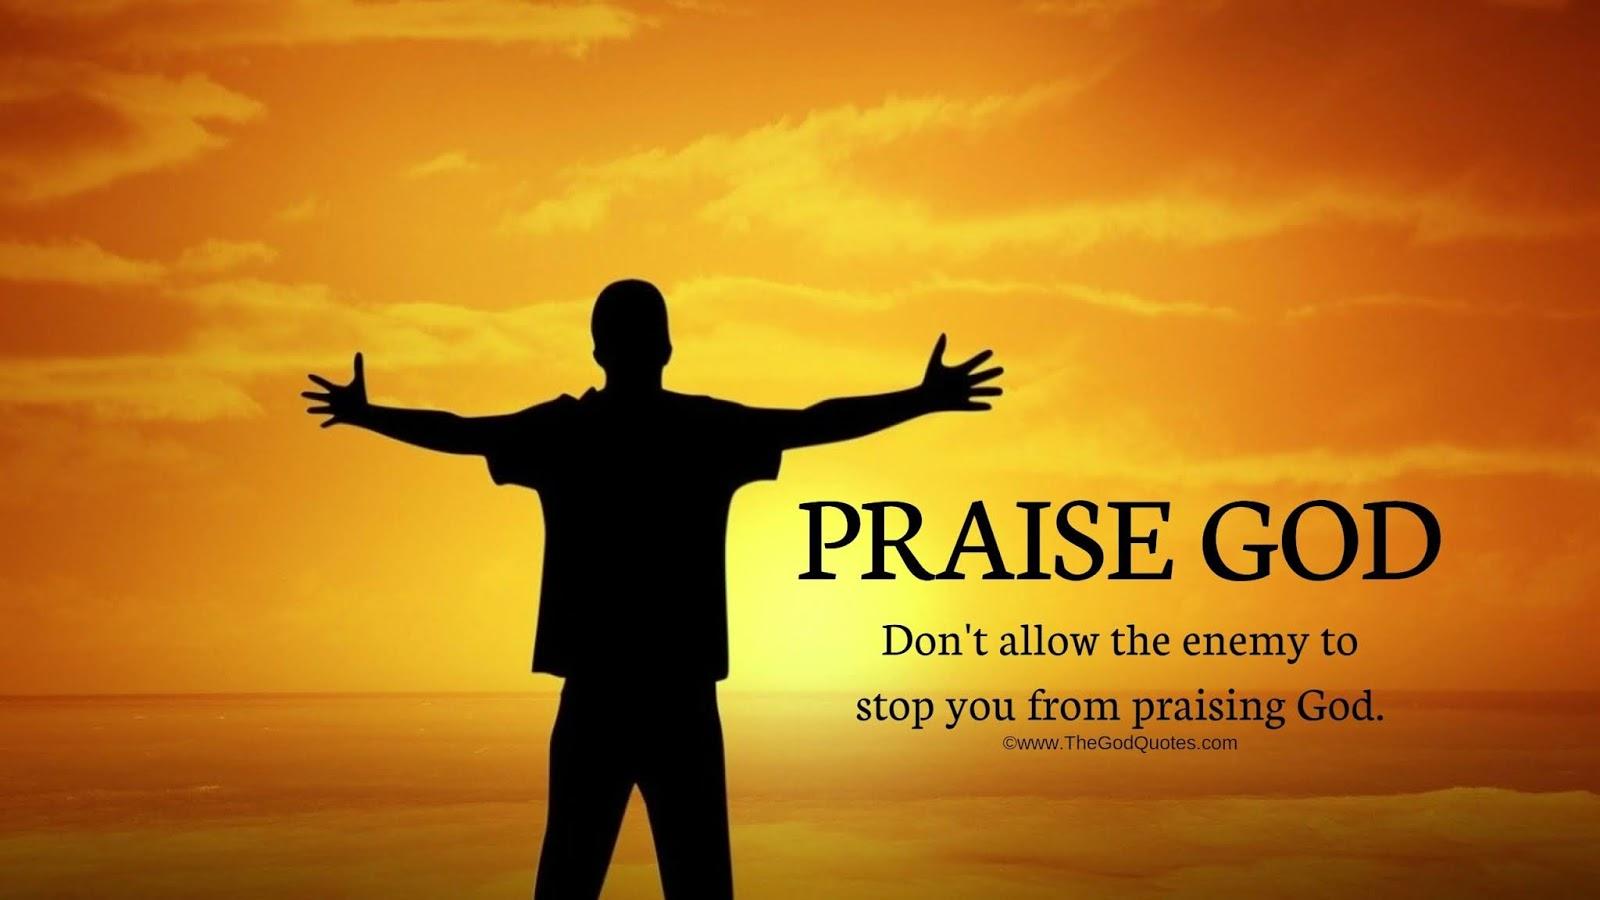 How To Praise God: Best 5 Effective Ways